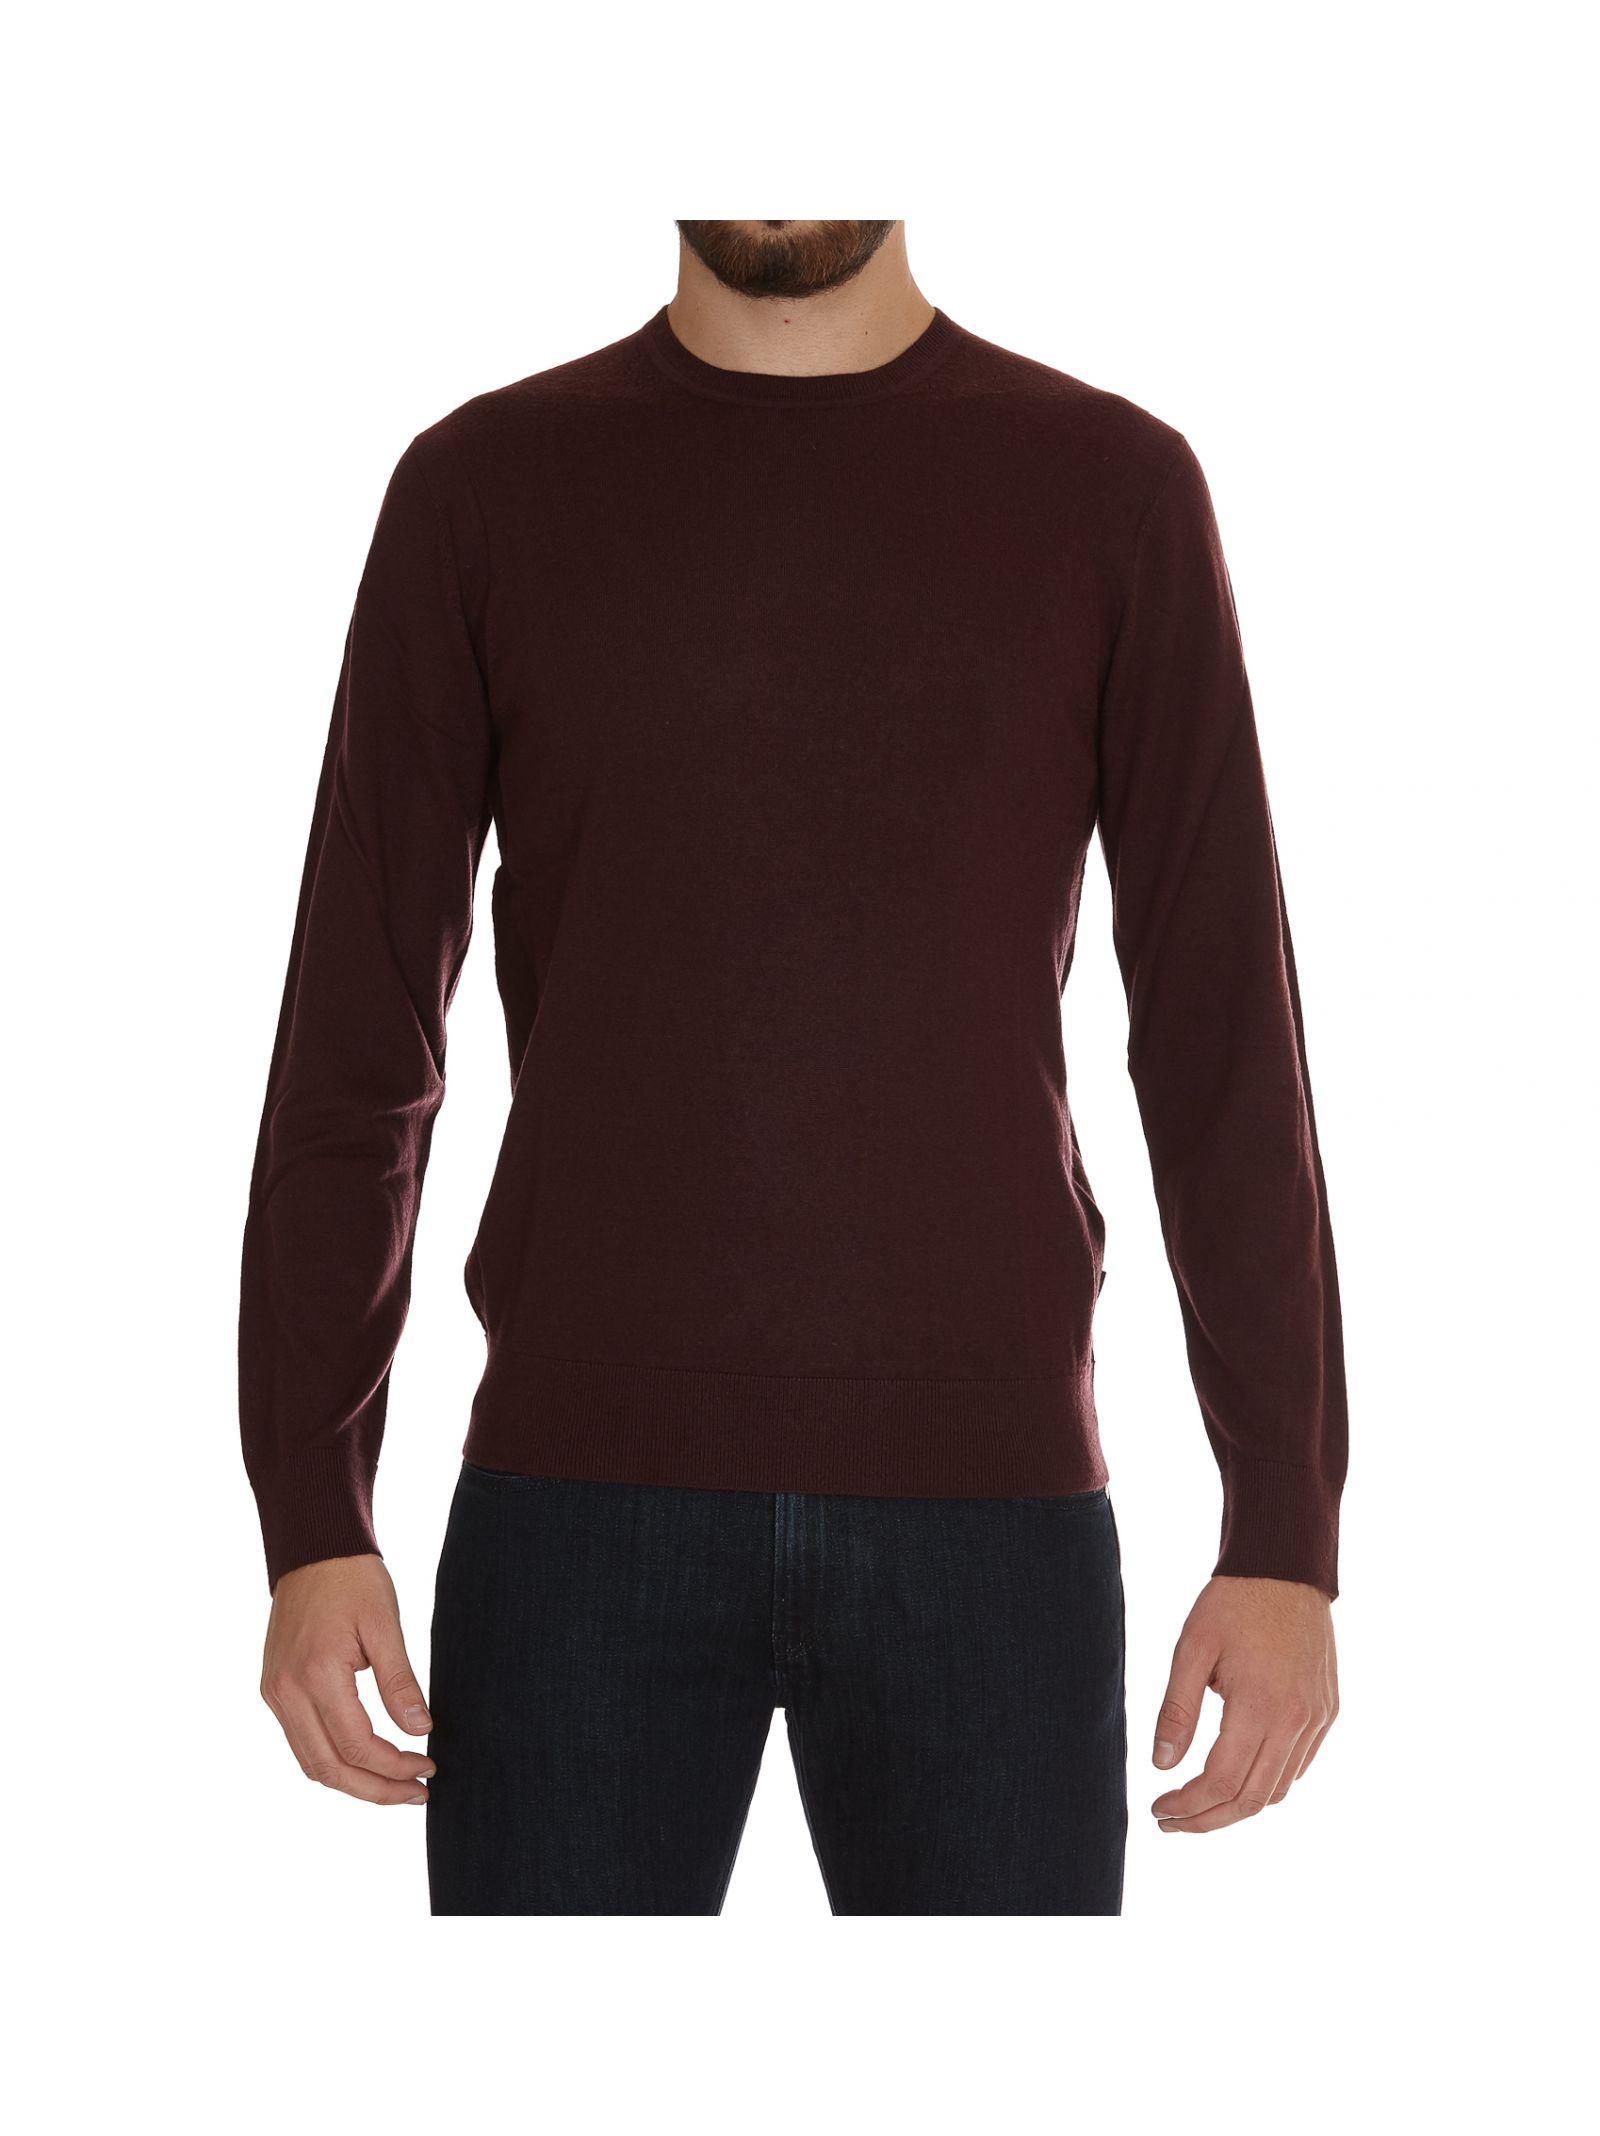 michael kors male 215965 michael kors sweater